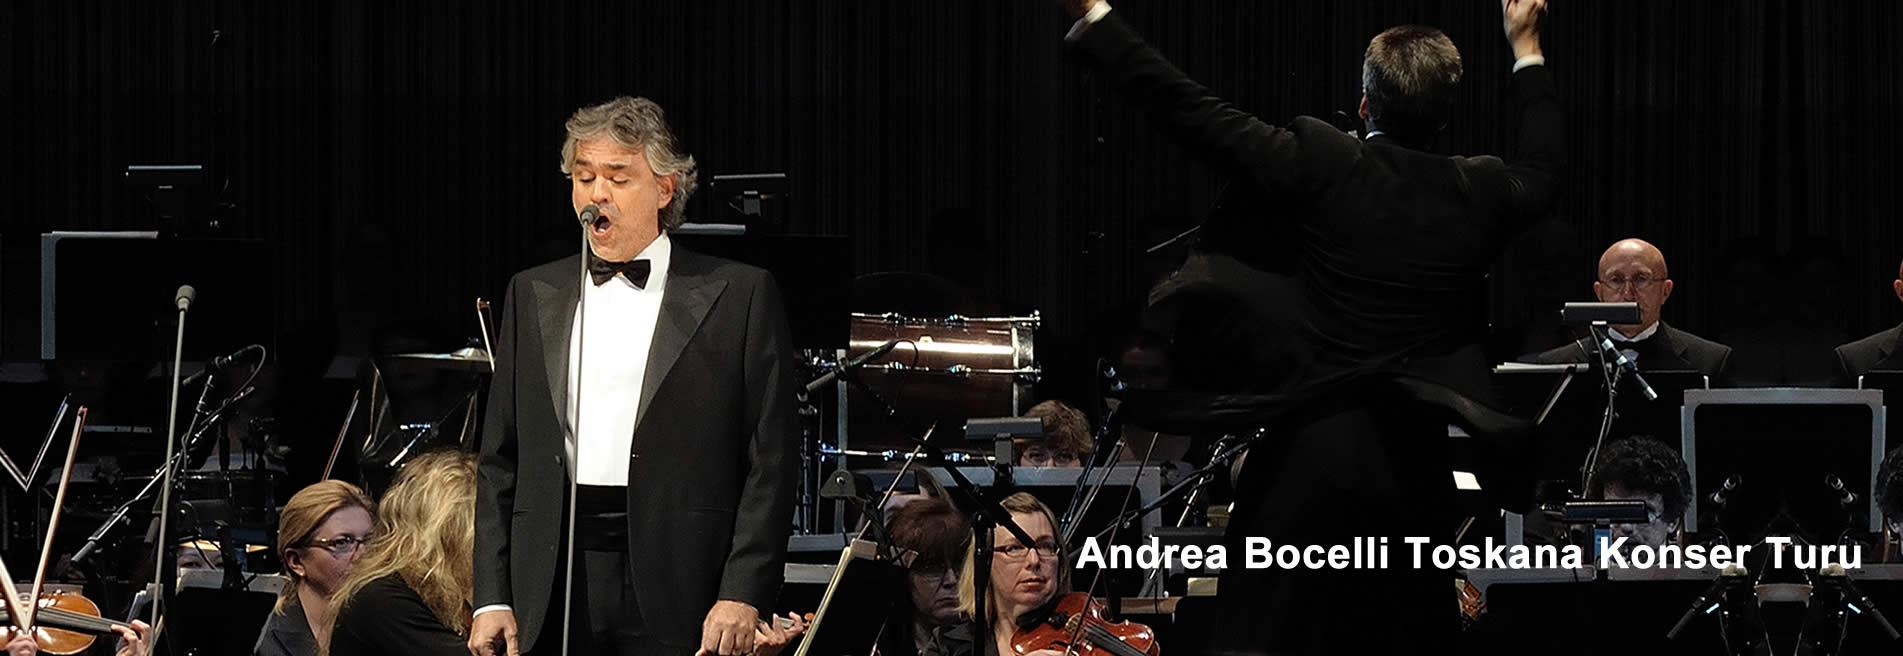 Andrea Bocelli Toskana Konser Turu